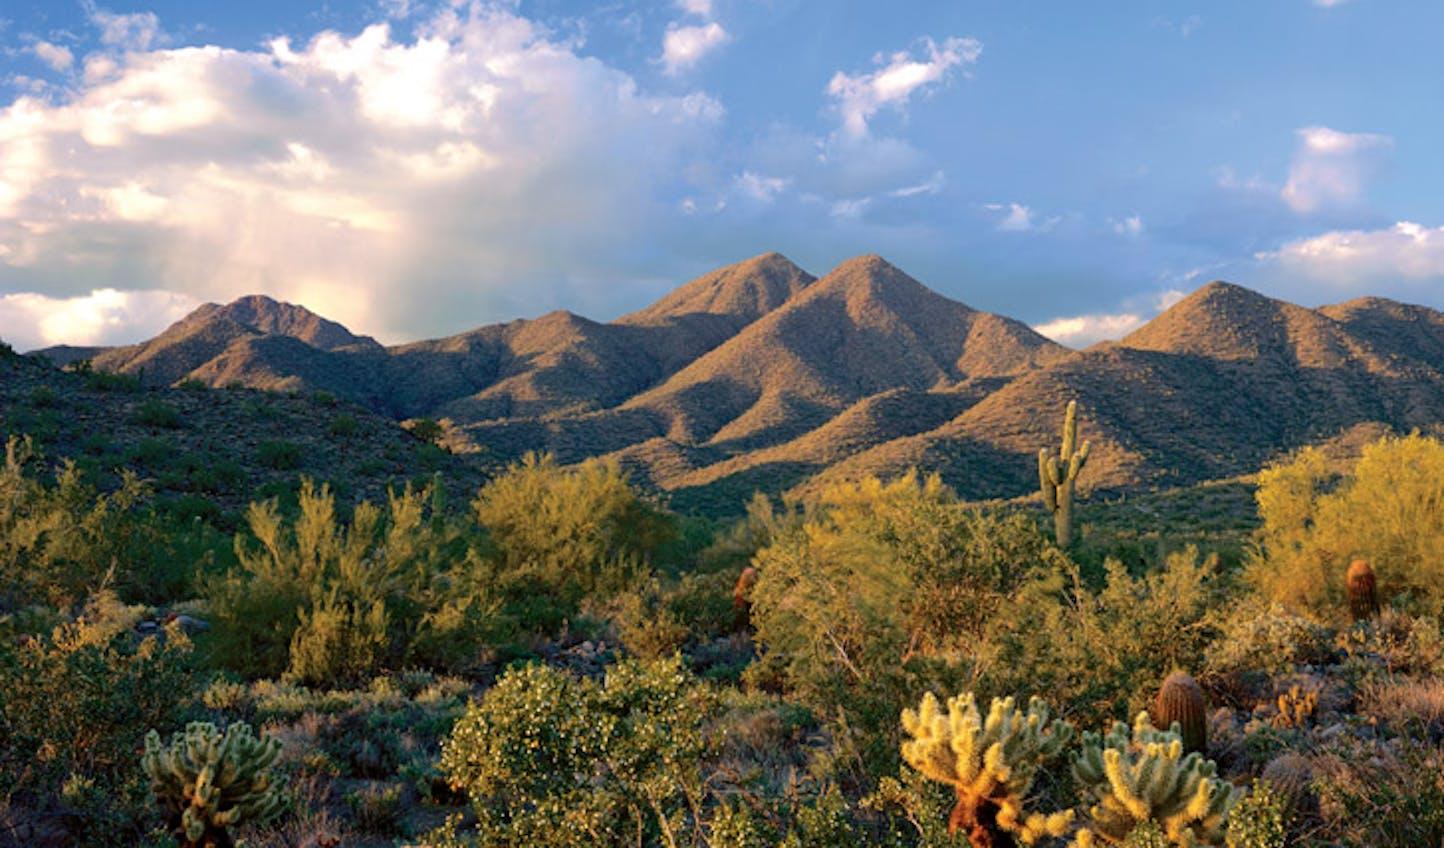 McDowell mountains, Scottsdale Arizona